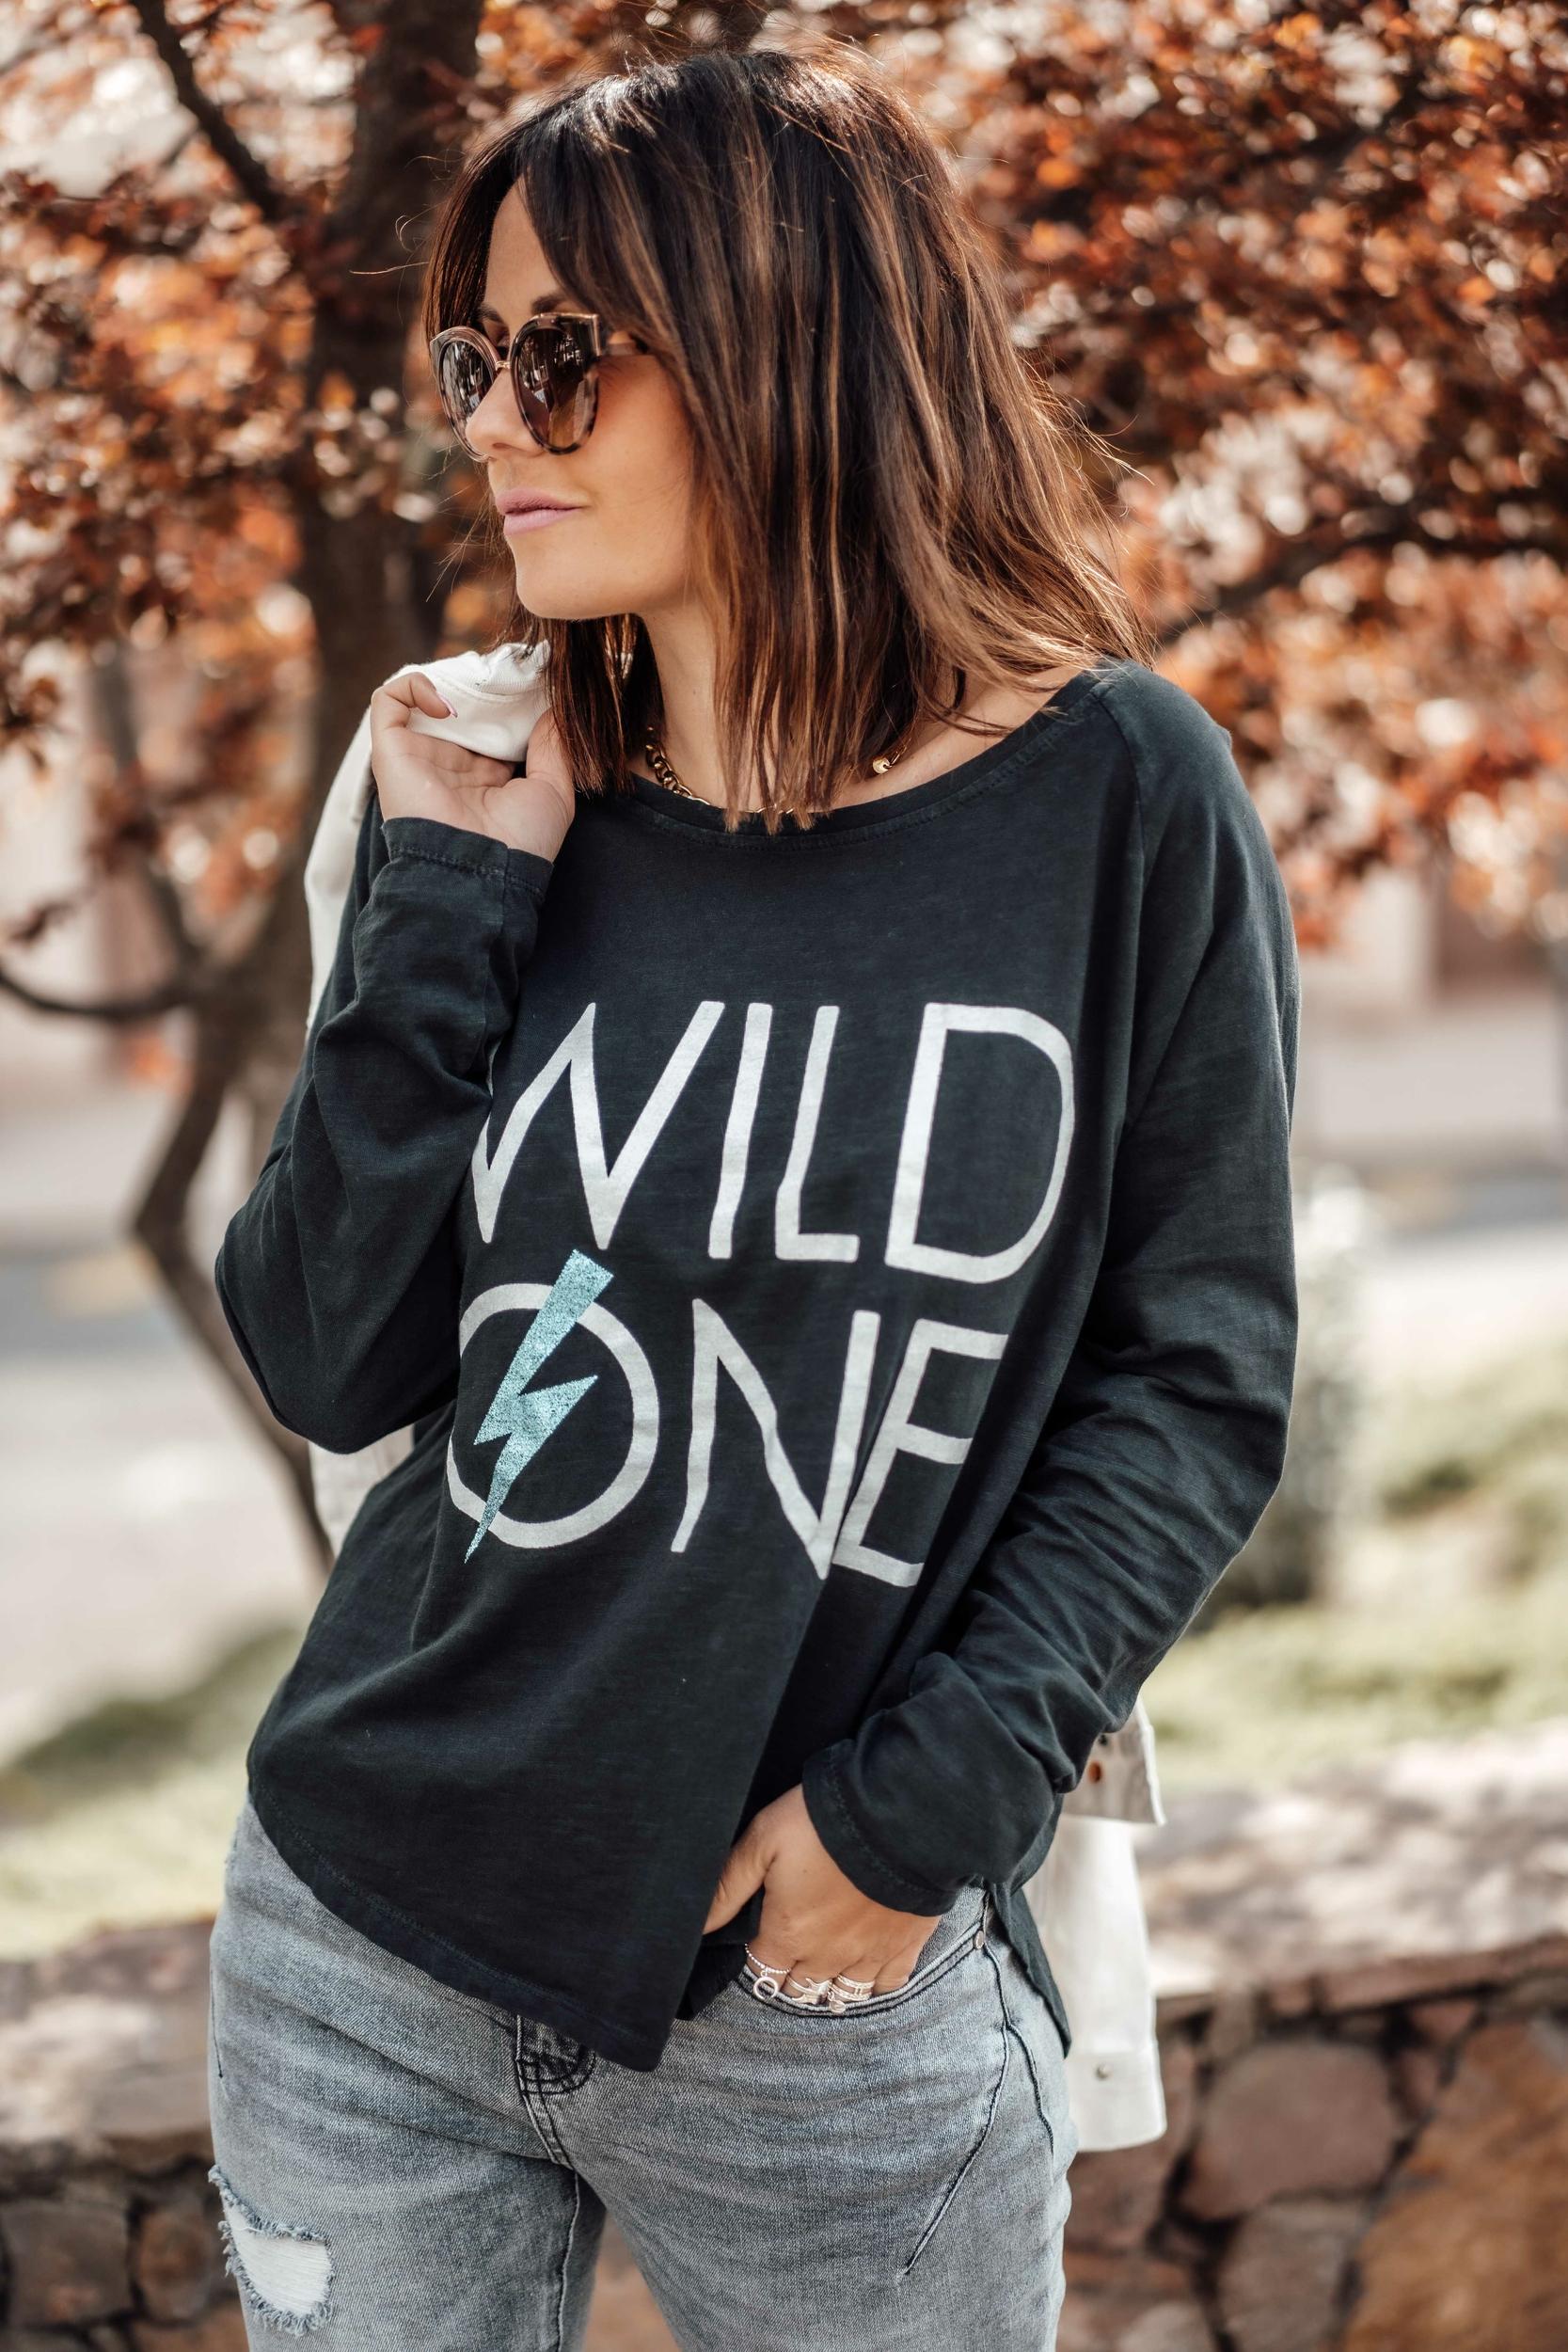 tee_wild one_noir-2